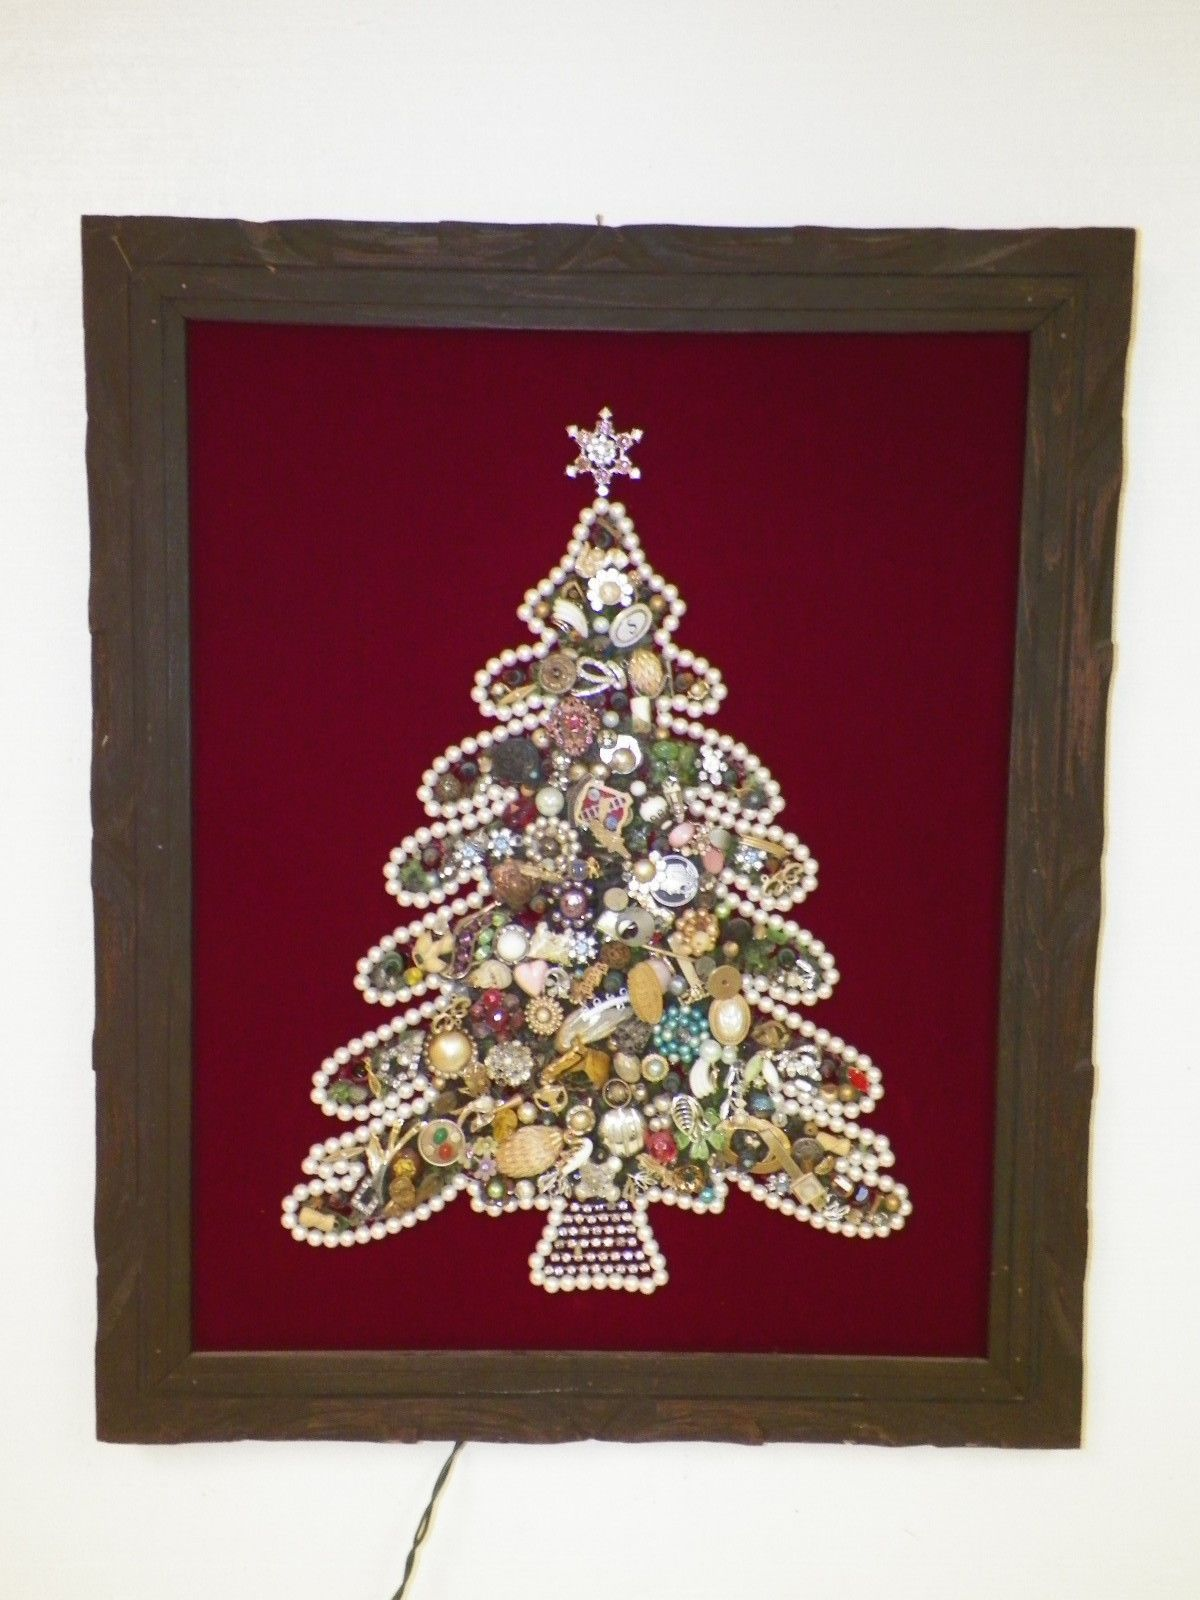 Vintage Rhinestone Costume Jewelry Christmas Tree Picture Lighted Framed Ebay 125 Christmas Tree Pictures Jewelry Christmas Tree Old Jewelry Crafts